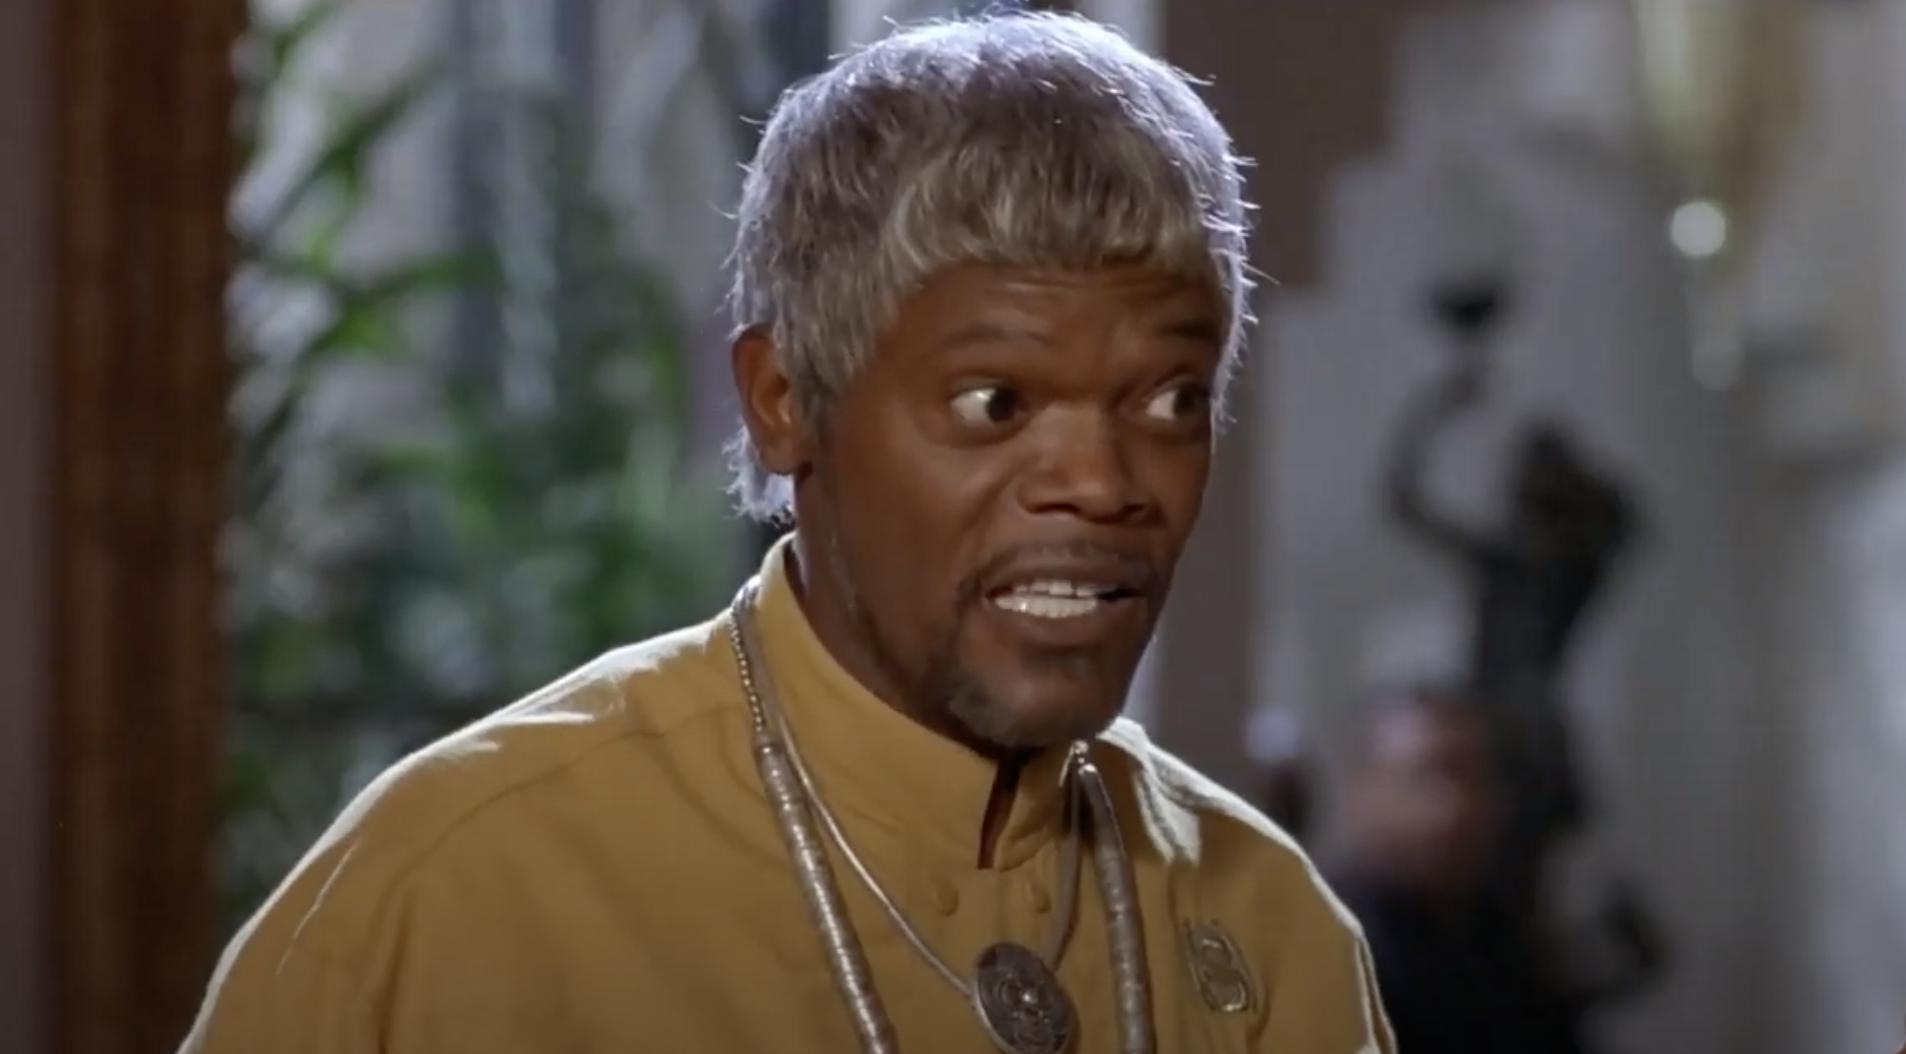 Samuel Jackson in a short, flat wig